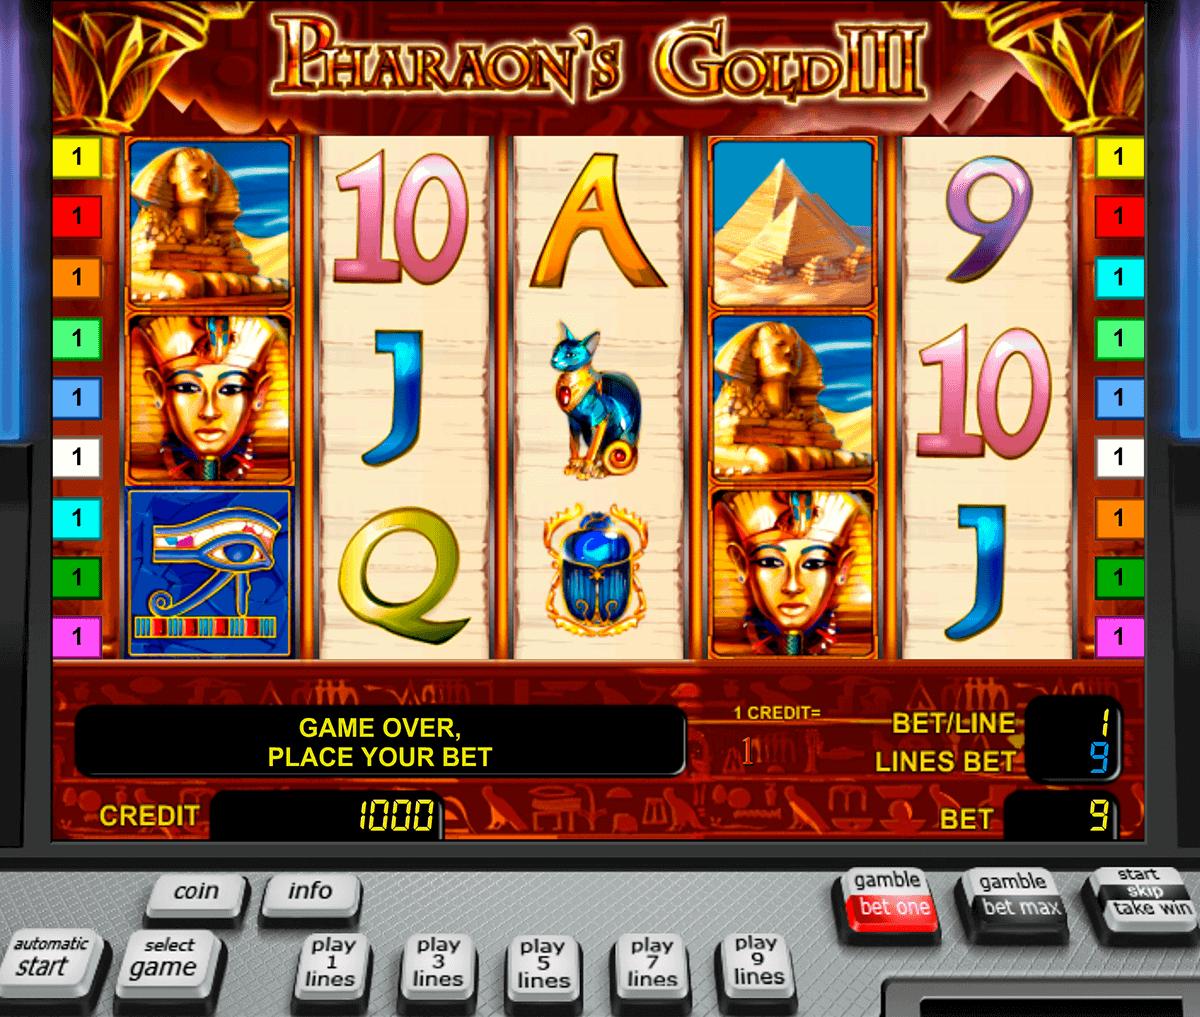 pharaohs gold iii novomatic spielautomaten